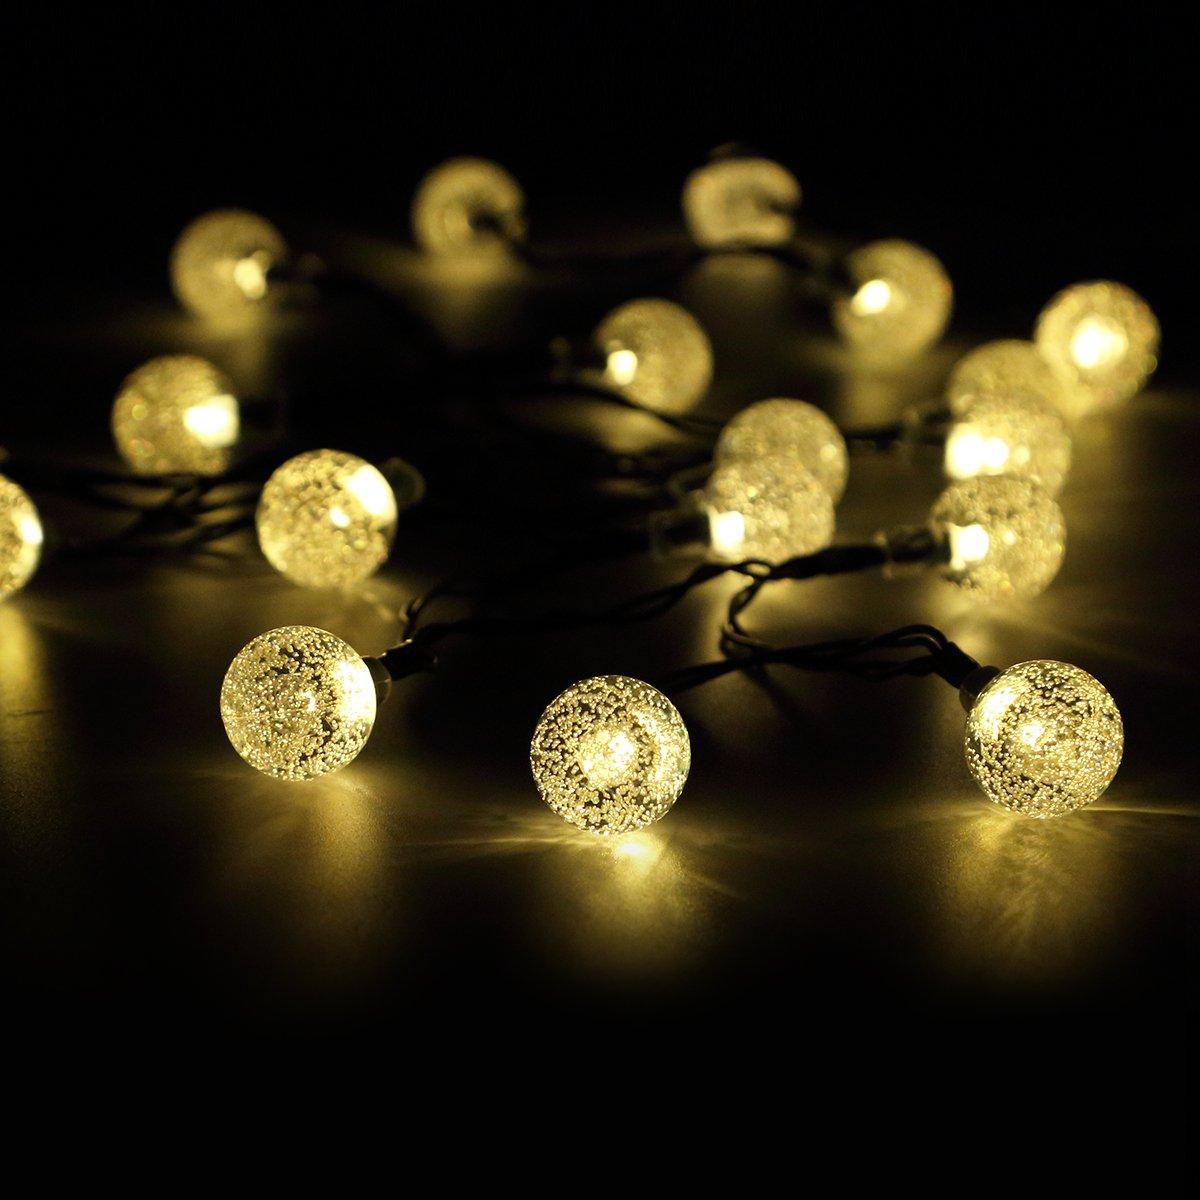 Warm White Solar Garden Fairy Lights: Solar String Garden Fairy Lights 50 LED Waterproof 22ft